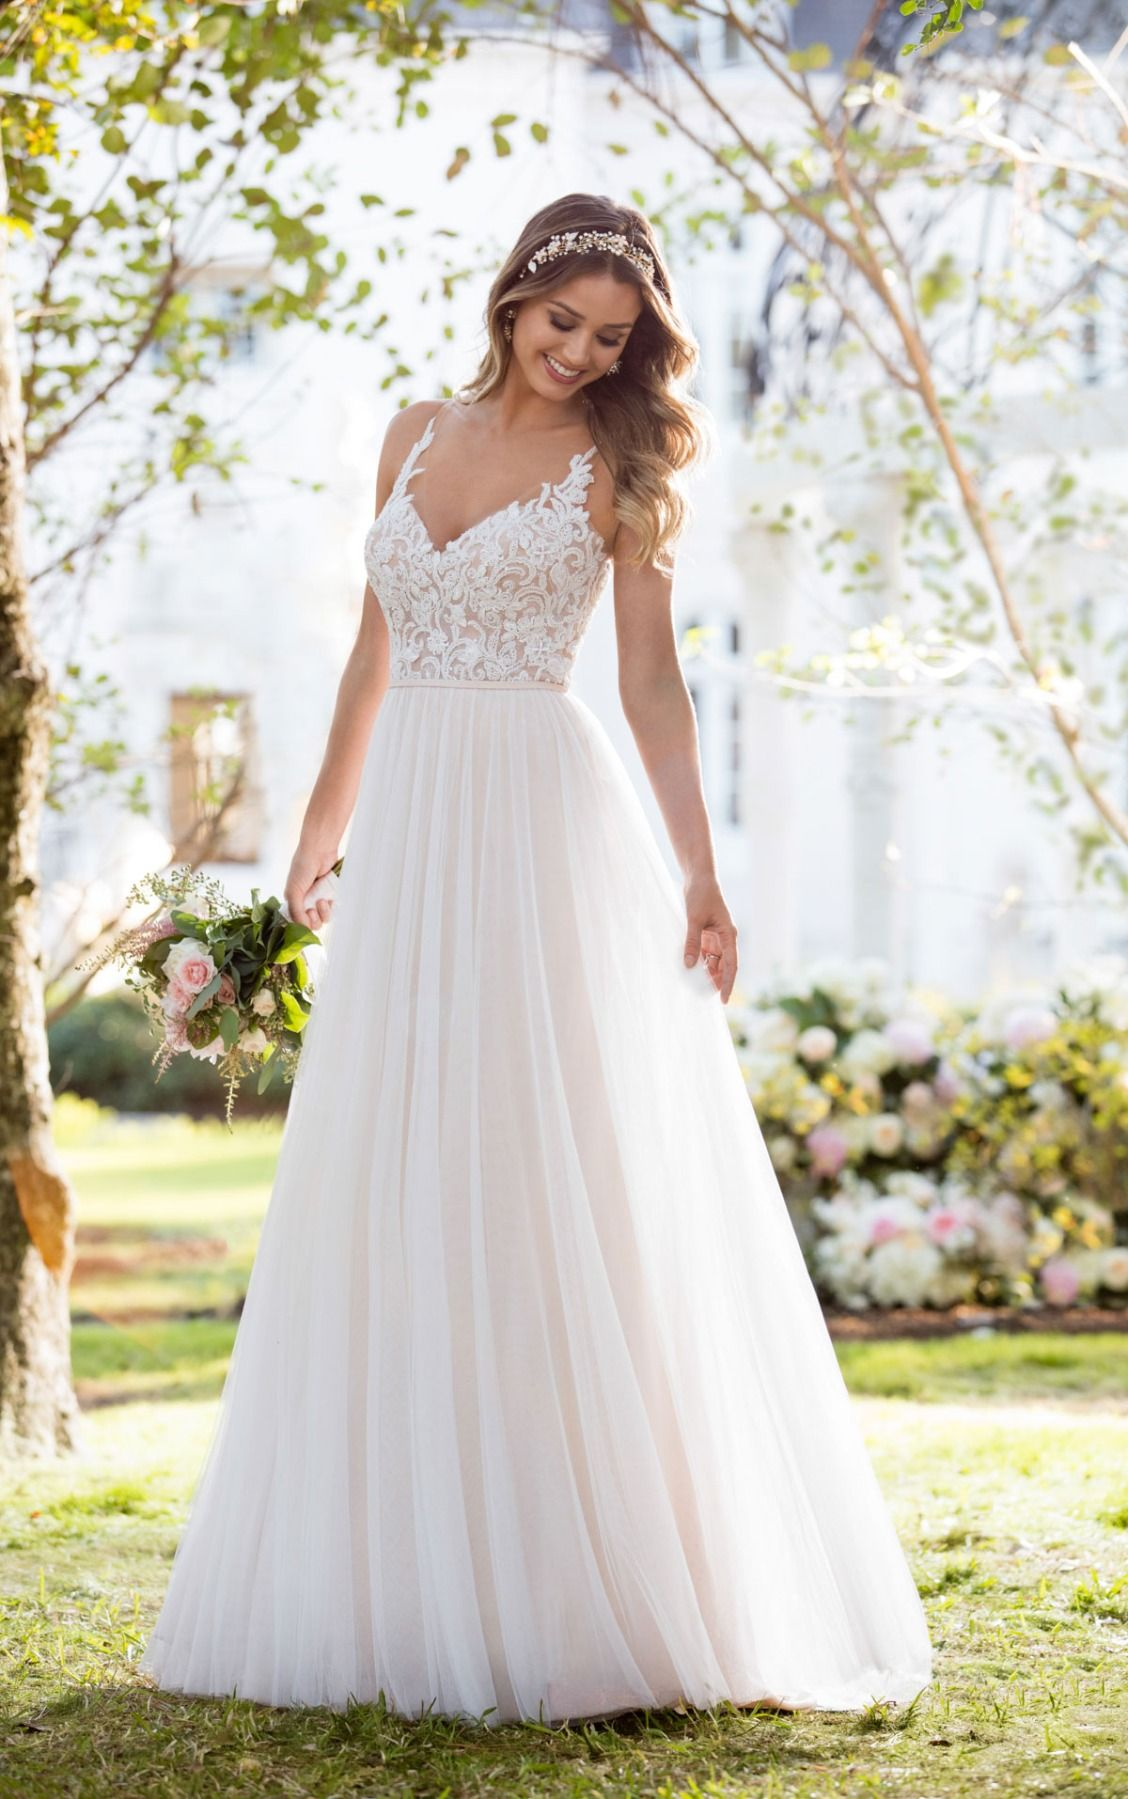 Wedding dresses stella york wedding dress and romantic